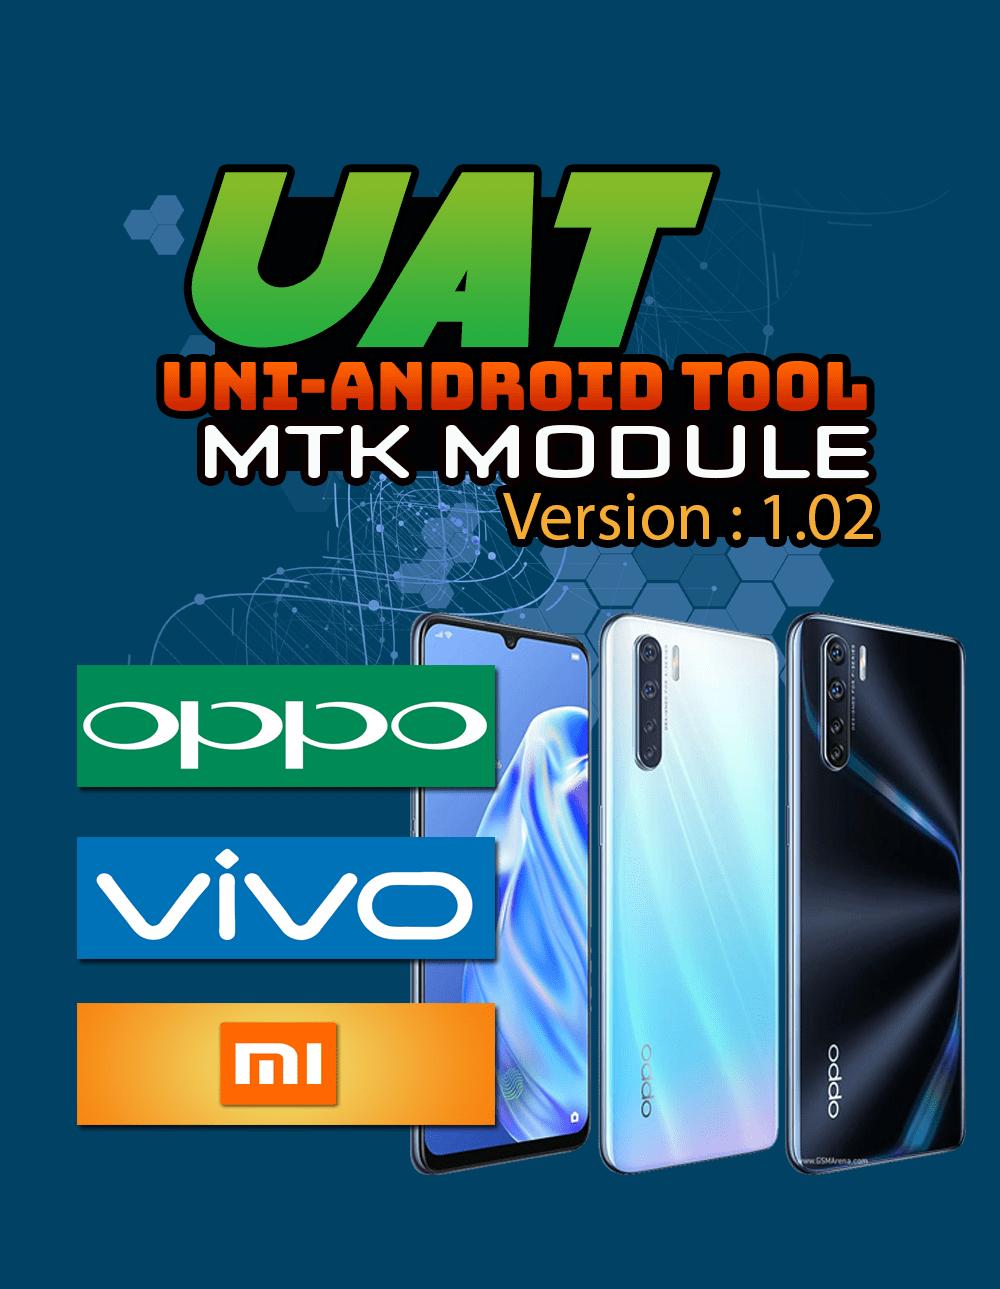 Uni-Android Tool UAT MTK Module Oppo, Vivo, Xiaomi Update Ver.1.02 [22nd Feb. 2021]